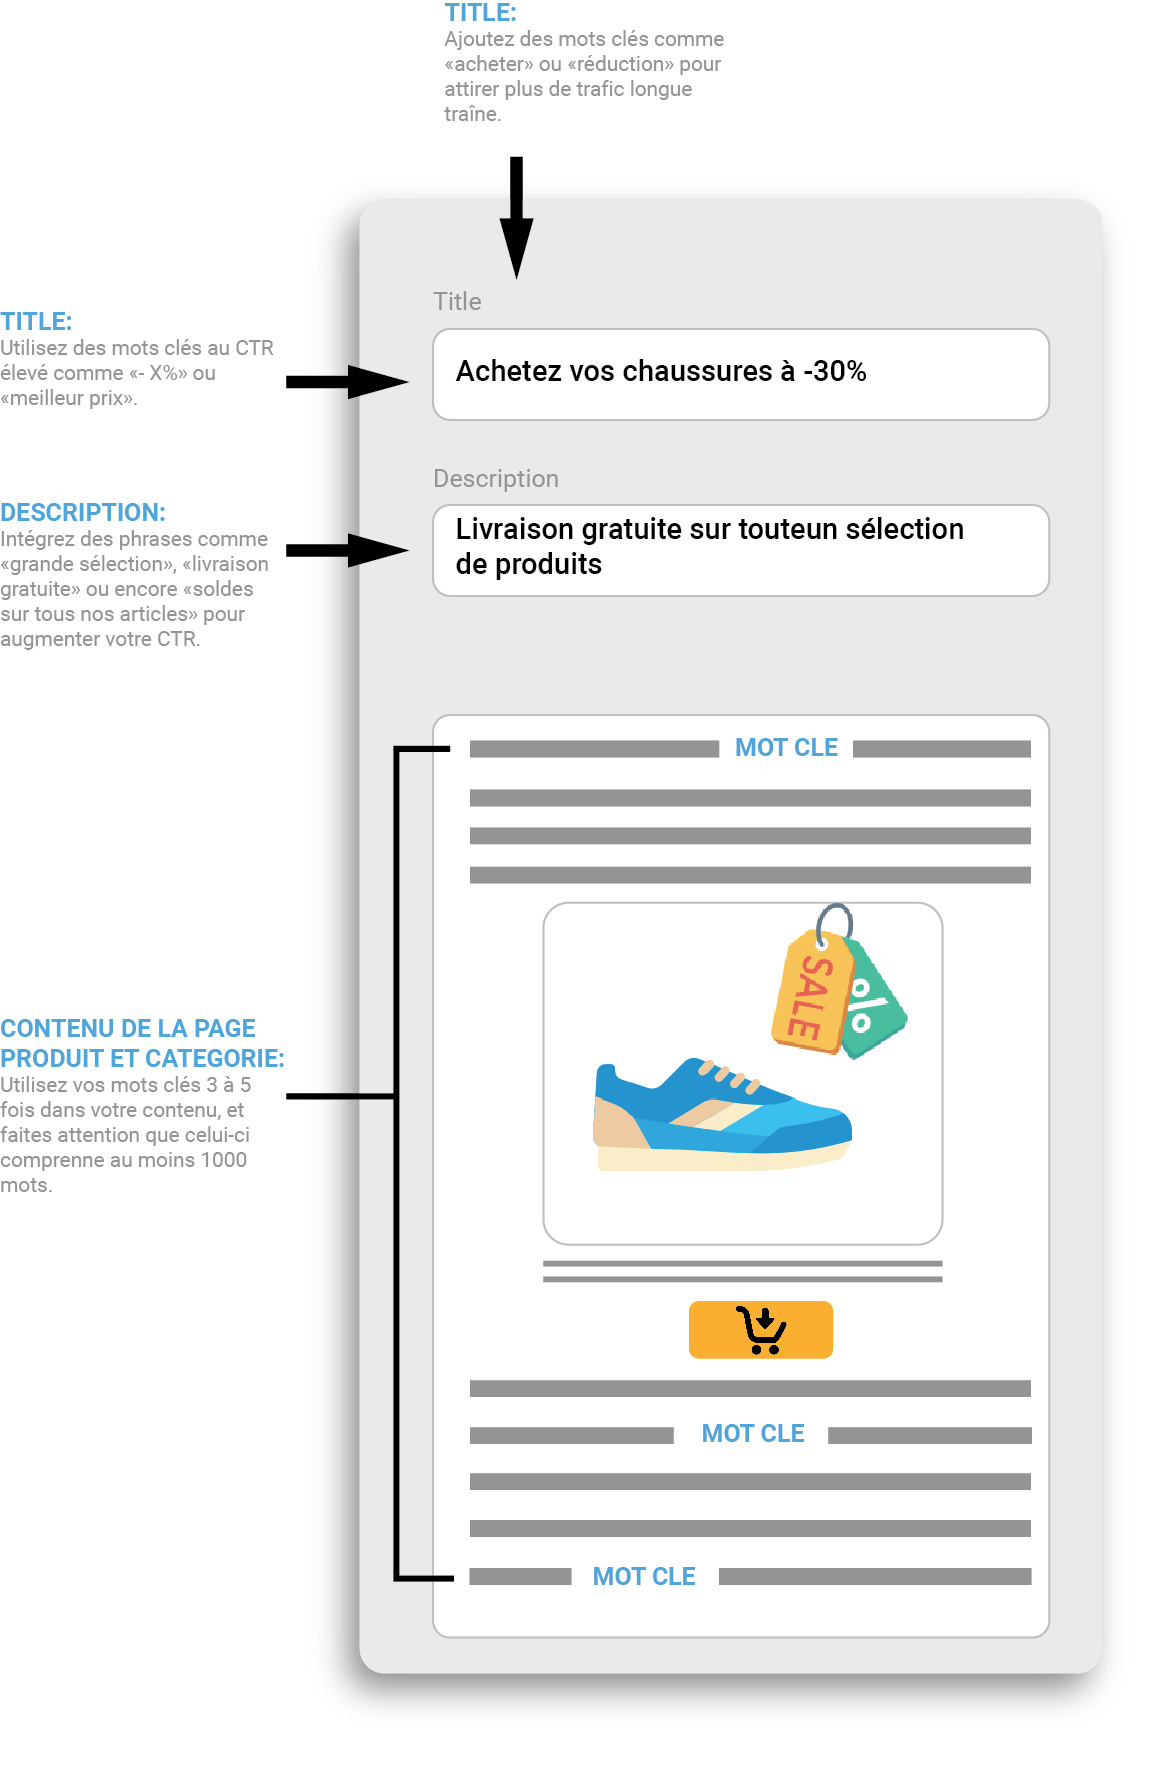 balise title description contenu e-commerce seo guide smartkeyword